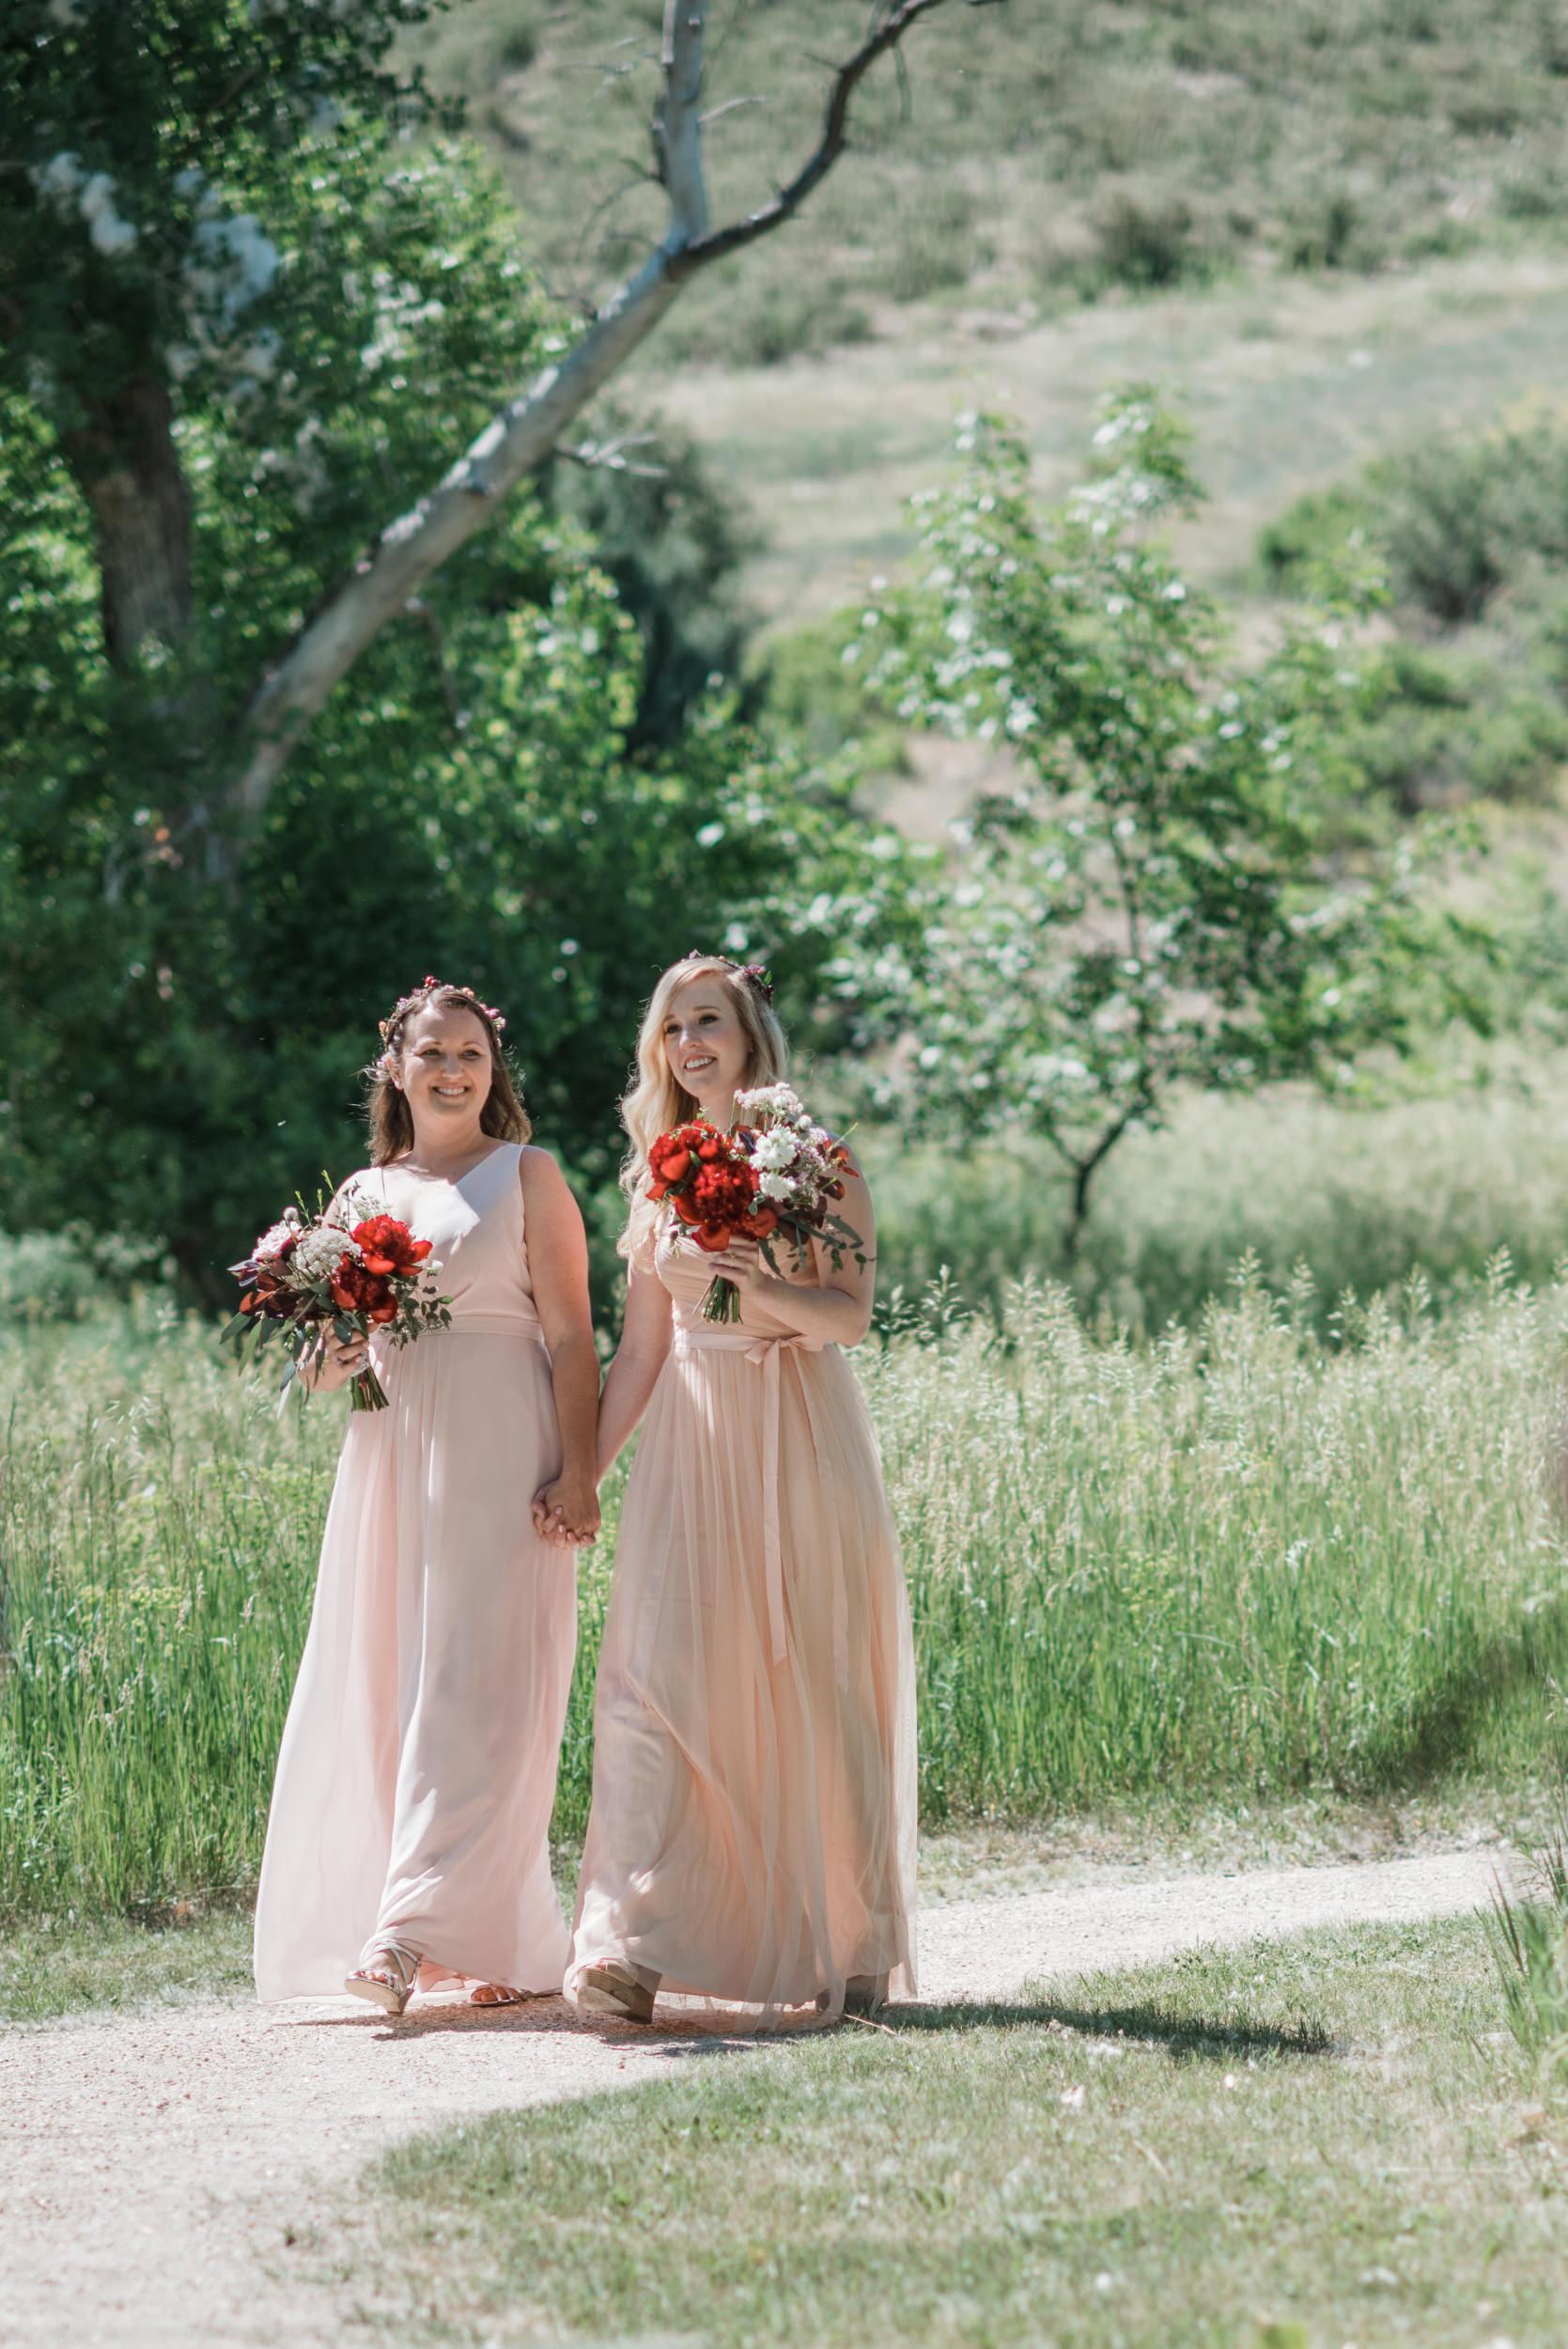 Colorado-Wedding-Fort-Collins-photographer-40.jpg